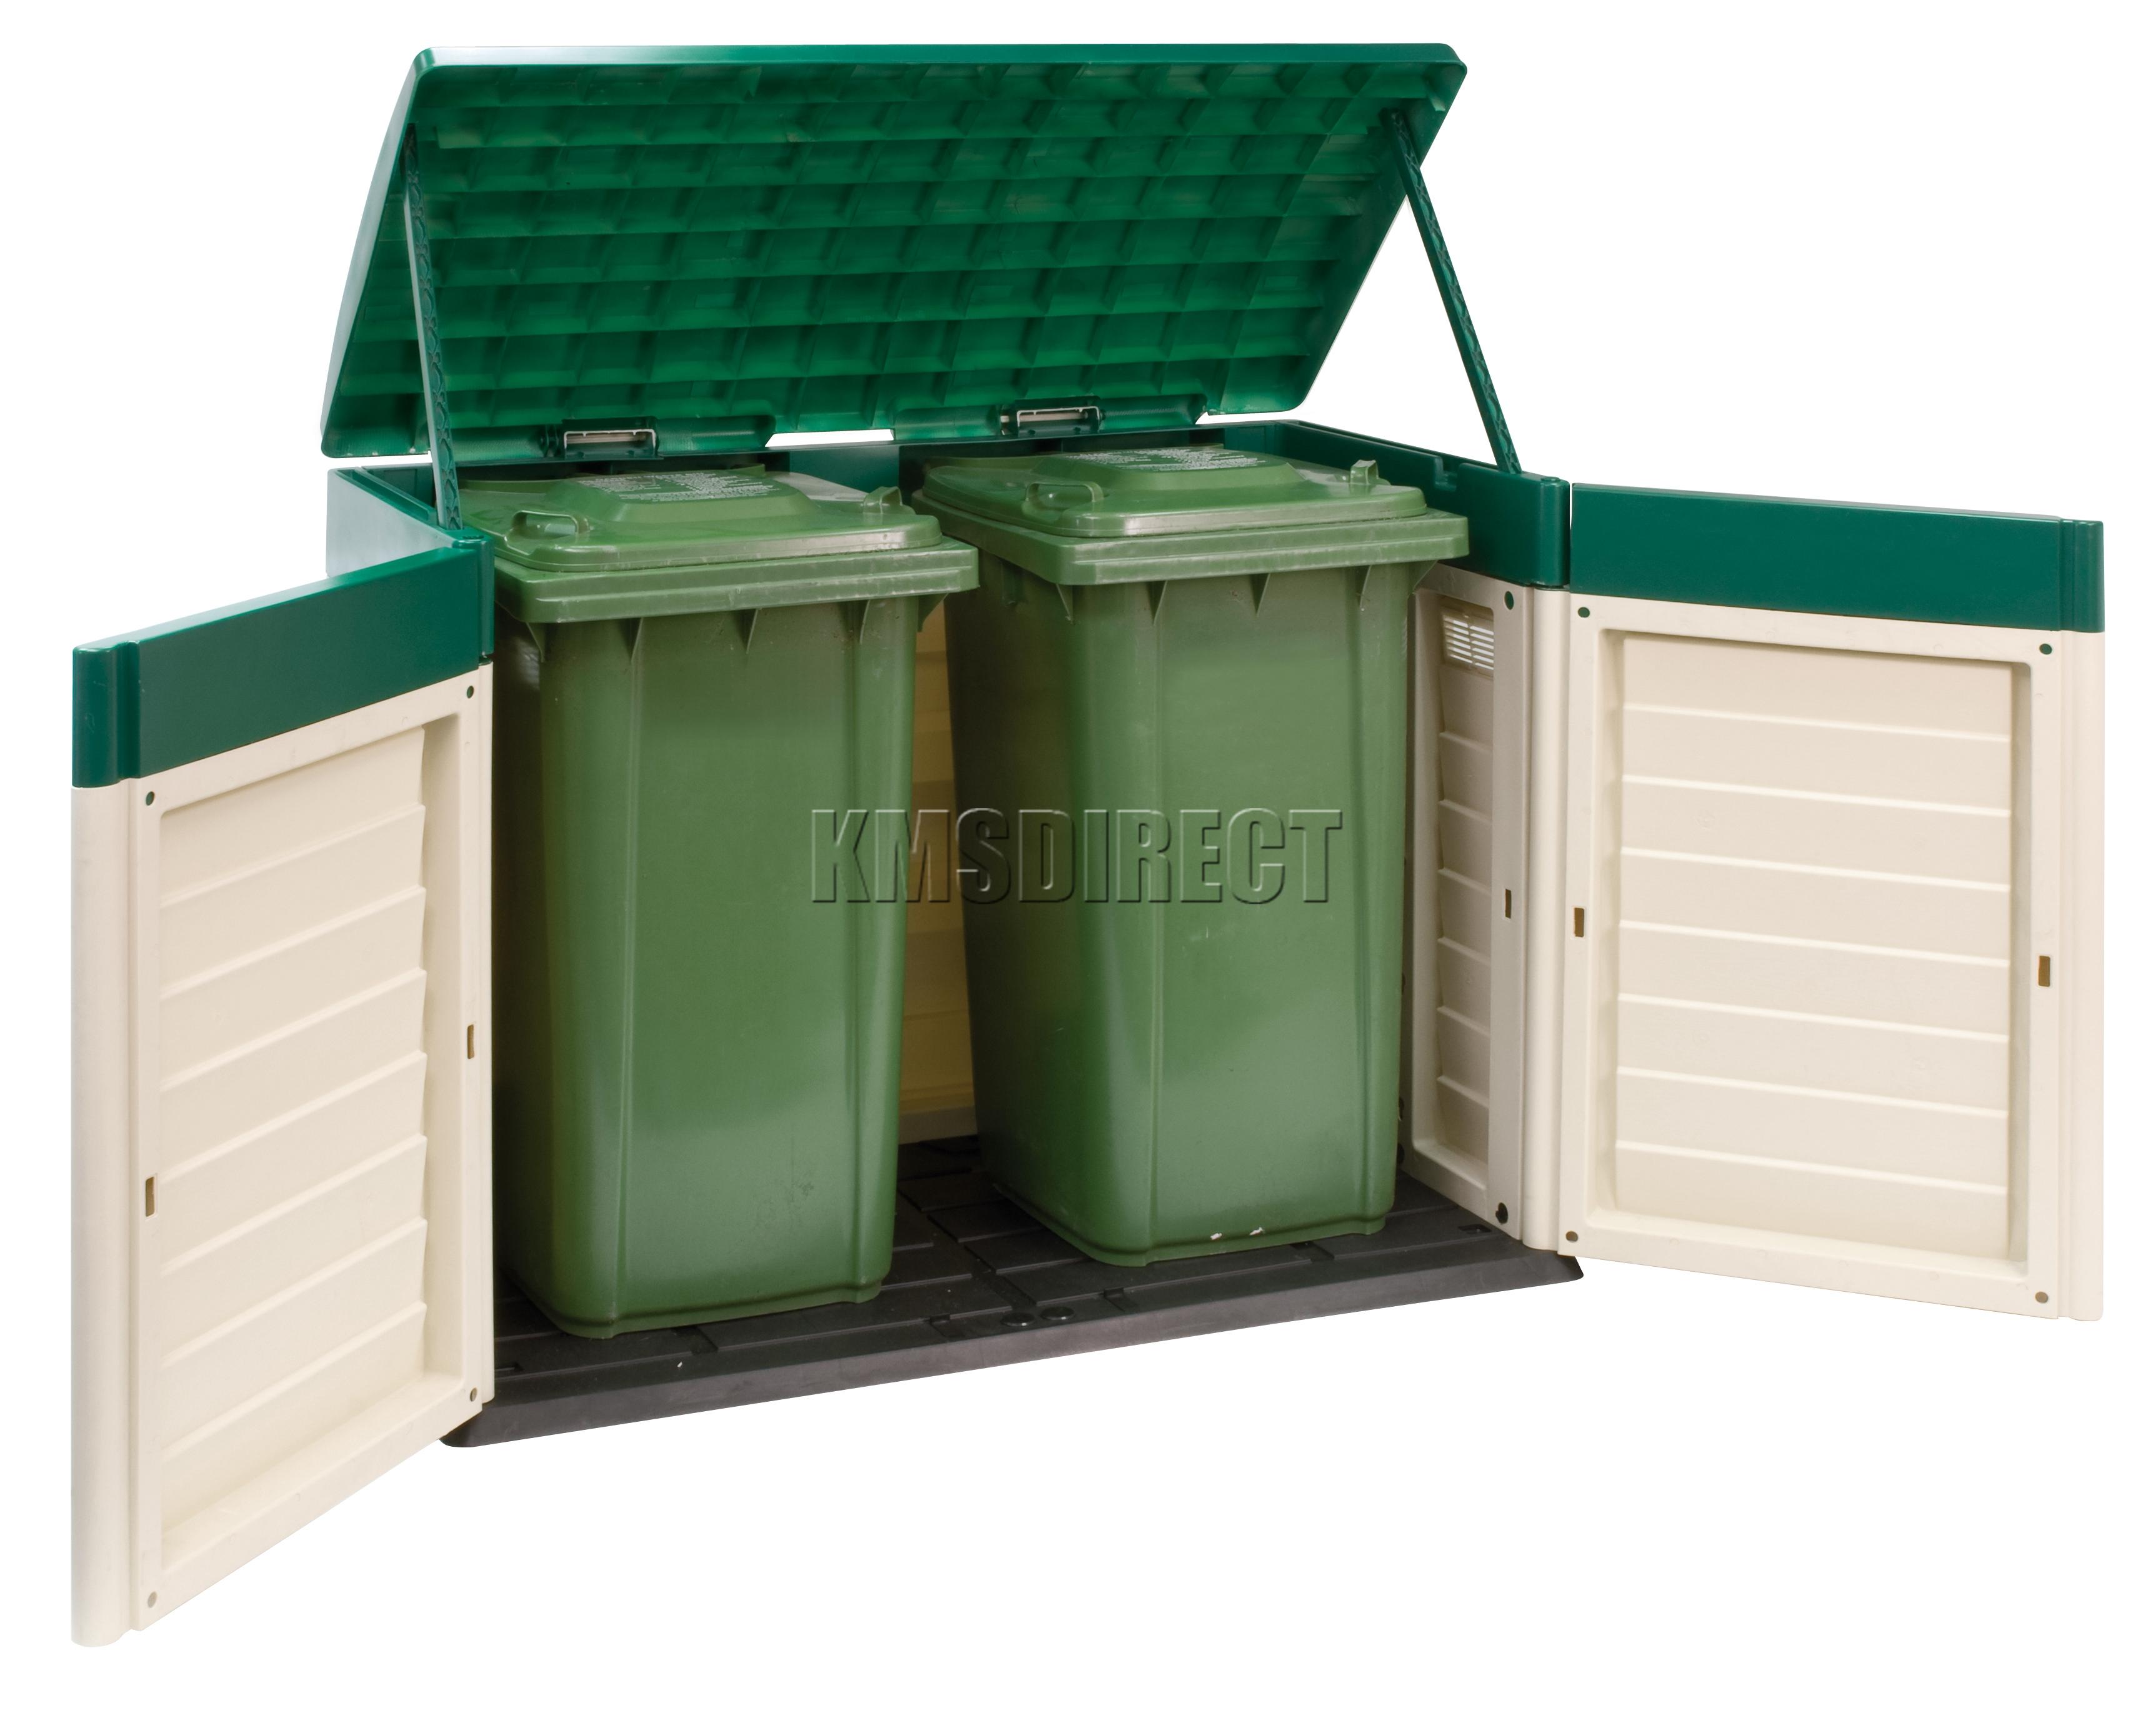 Starplast Outdoor Plastic Garden Low Bin Shed Box Chest